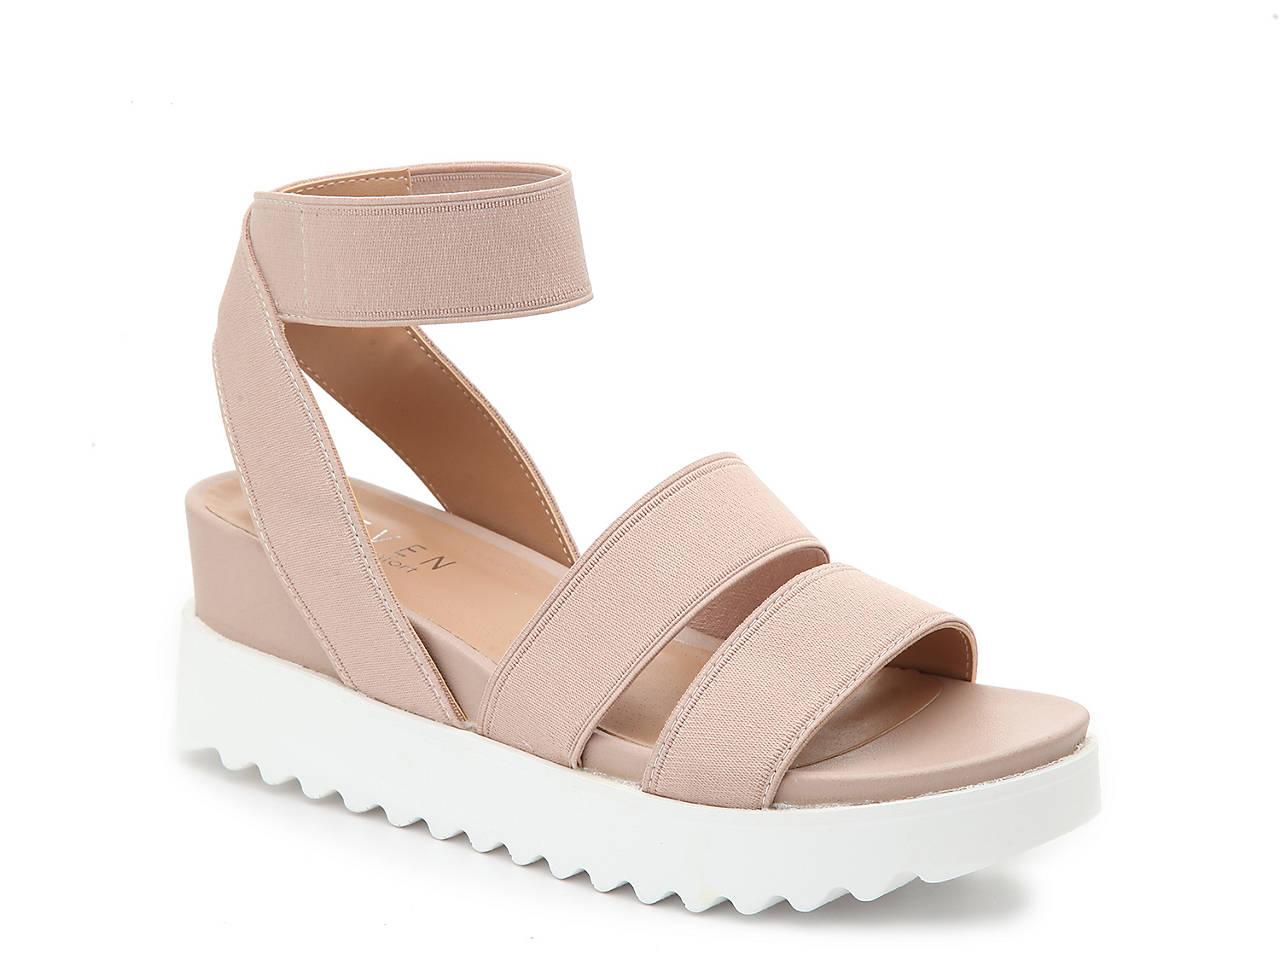 444792509b93 Steven by Steve Madden Kenza Wedge Sandal Women's Shoes | DSW